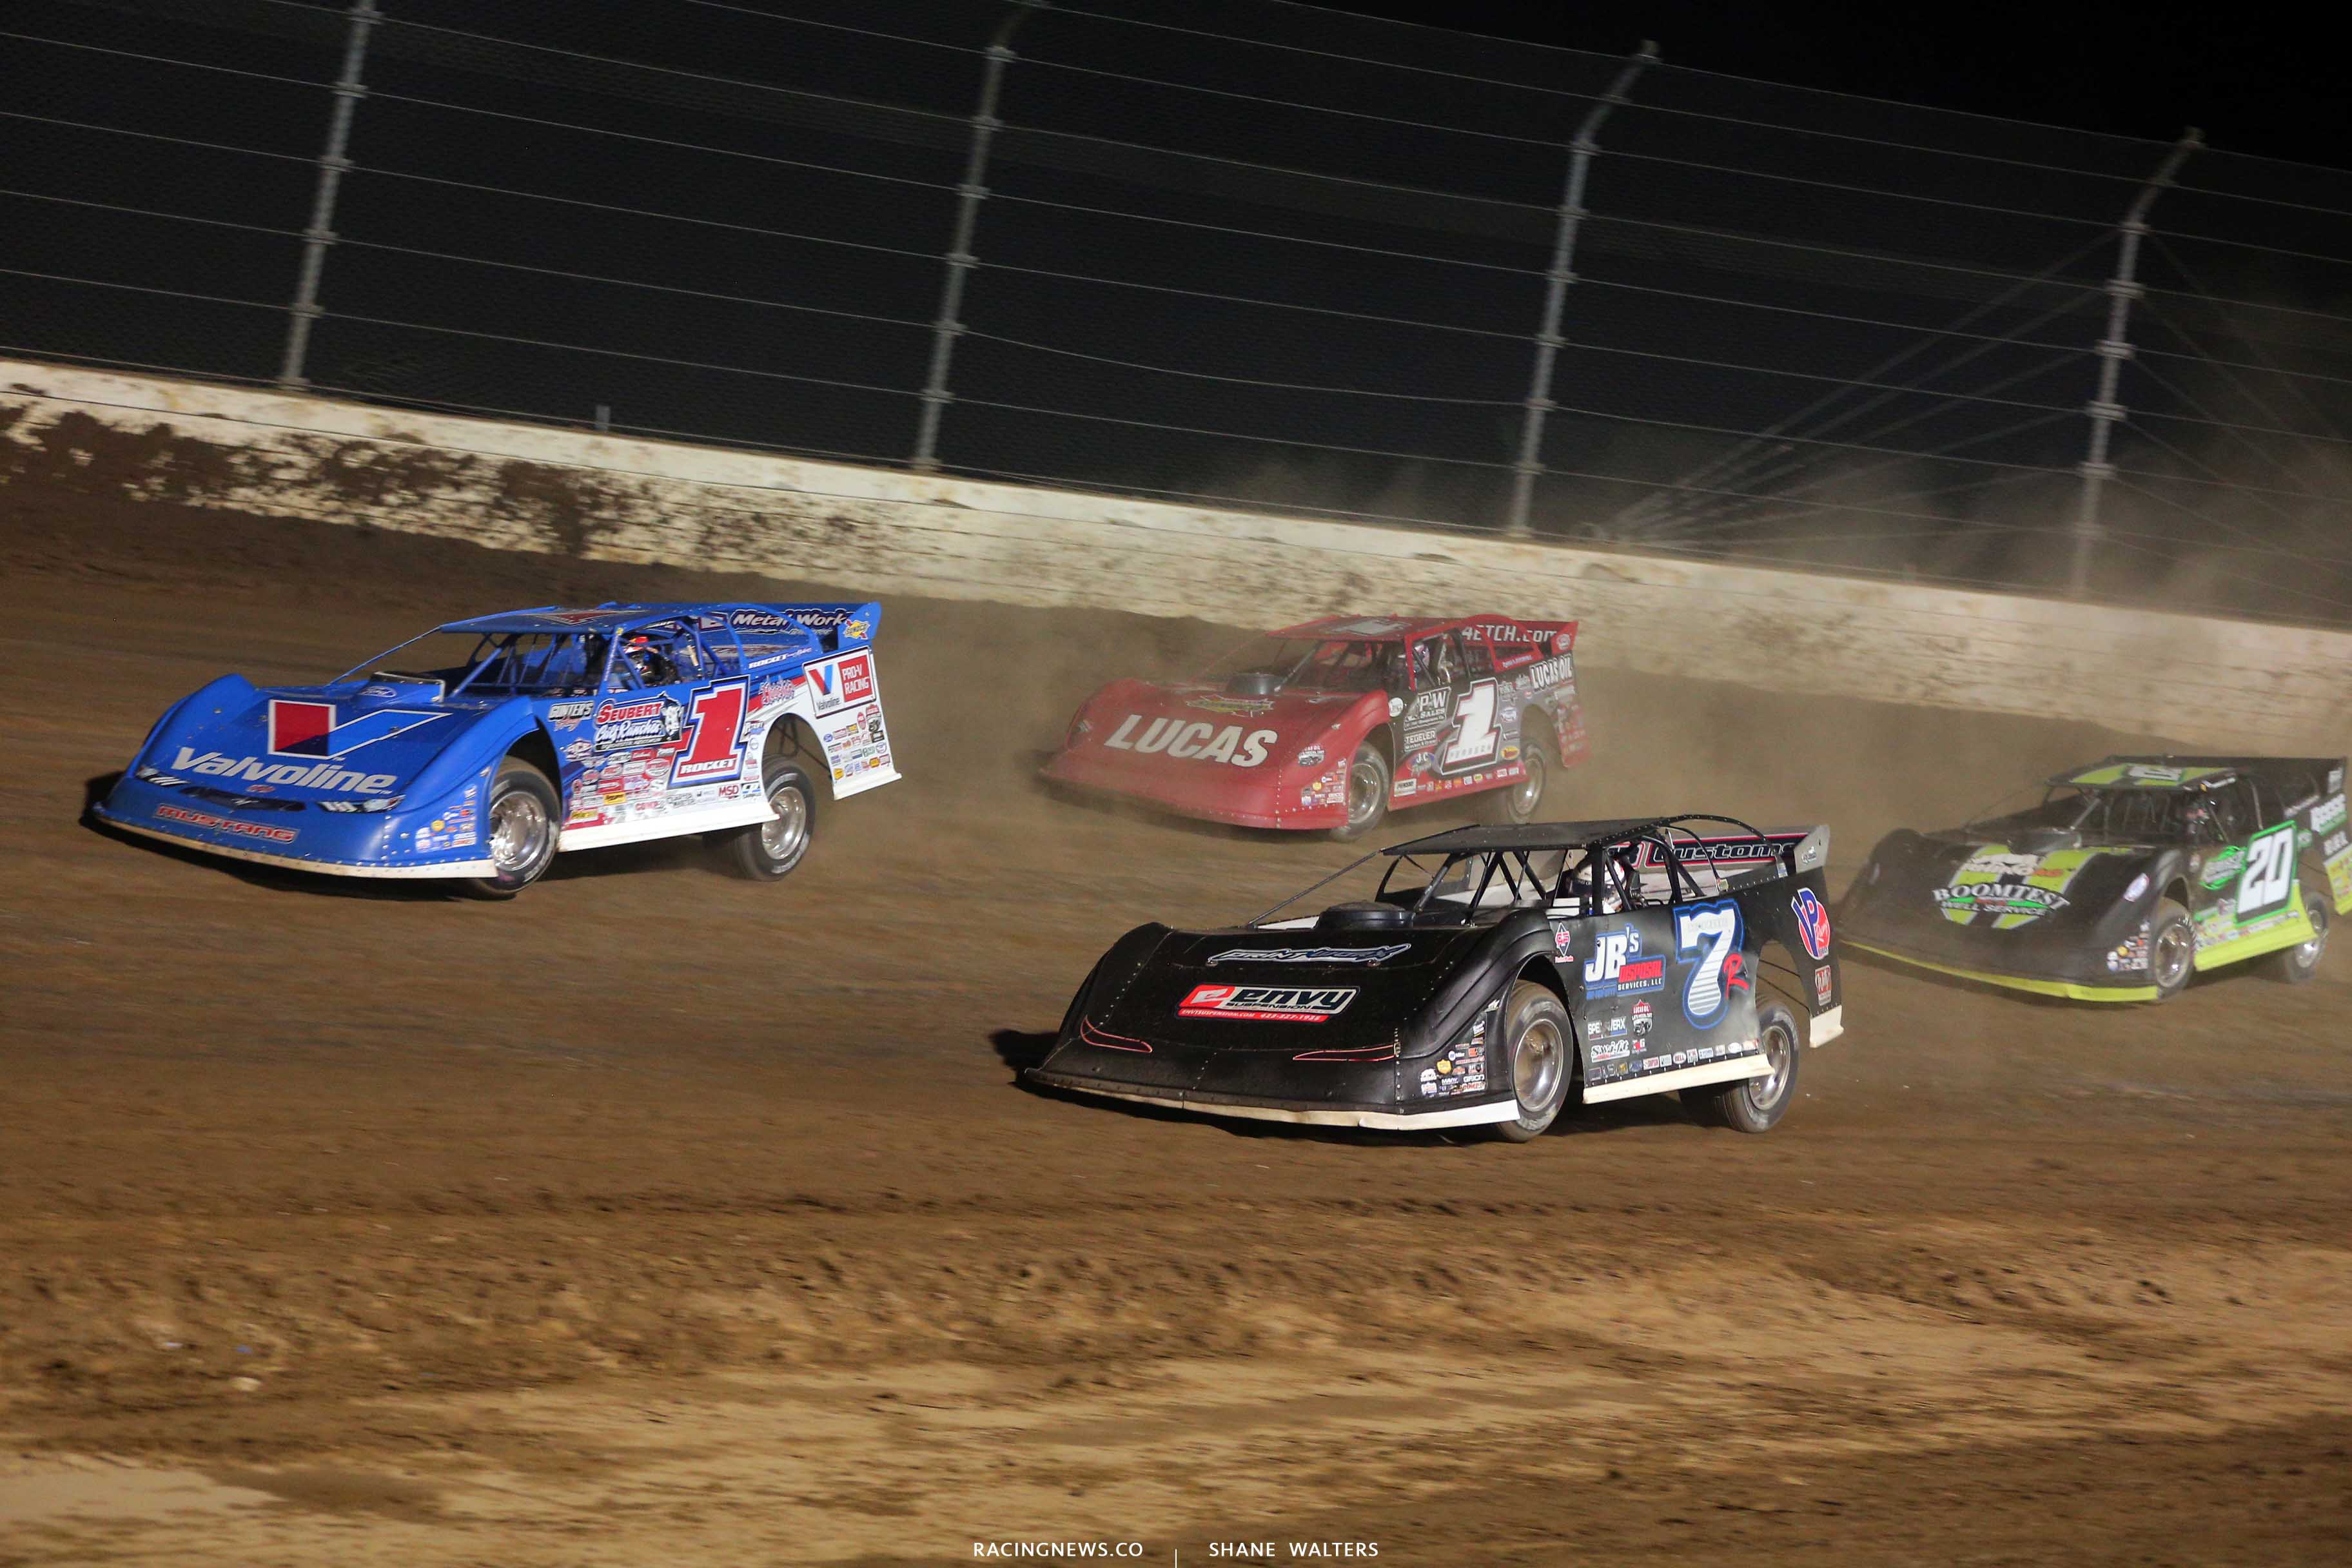 Brandon Sheppard, Kent Robinson, Earl Pearson Jr and Jimmy Owens at Mansfield Motor Speedway - Dirt Million 5334